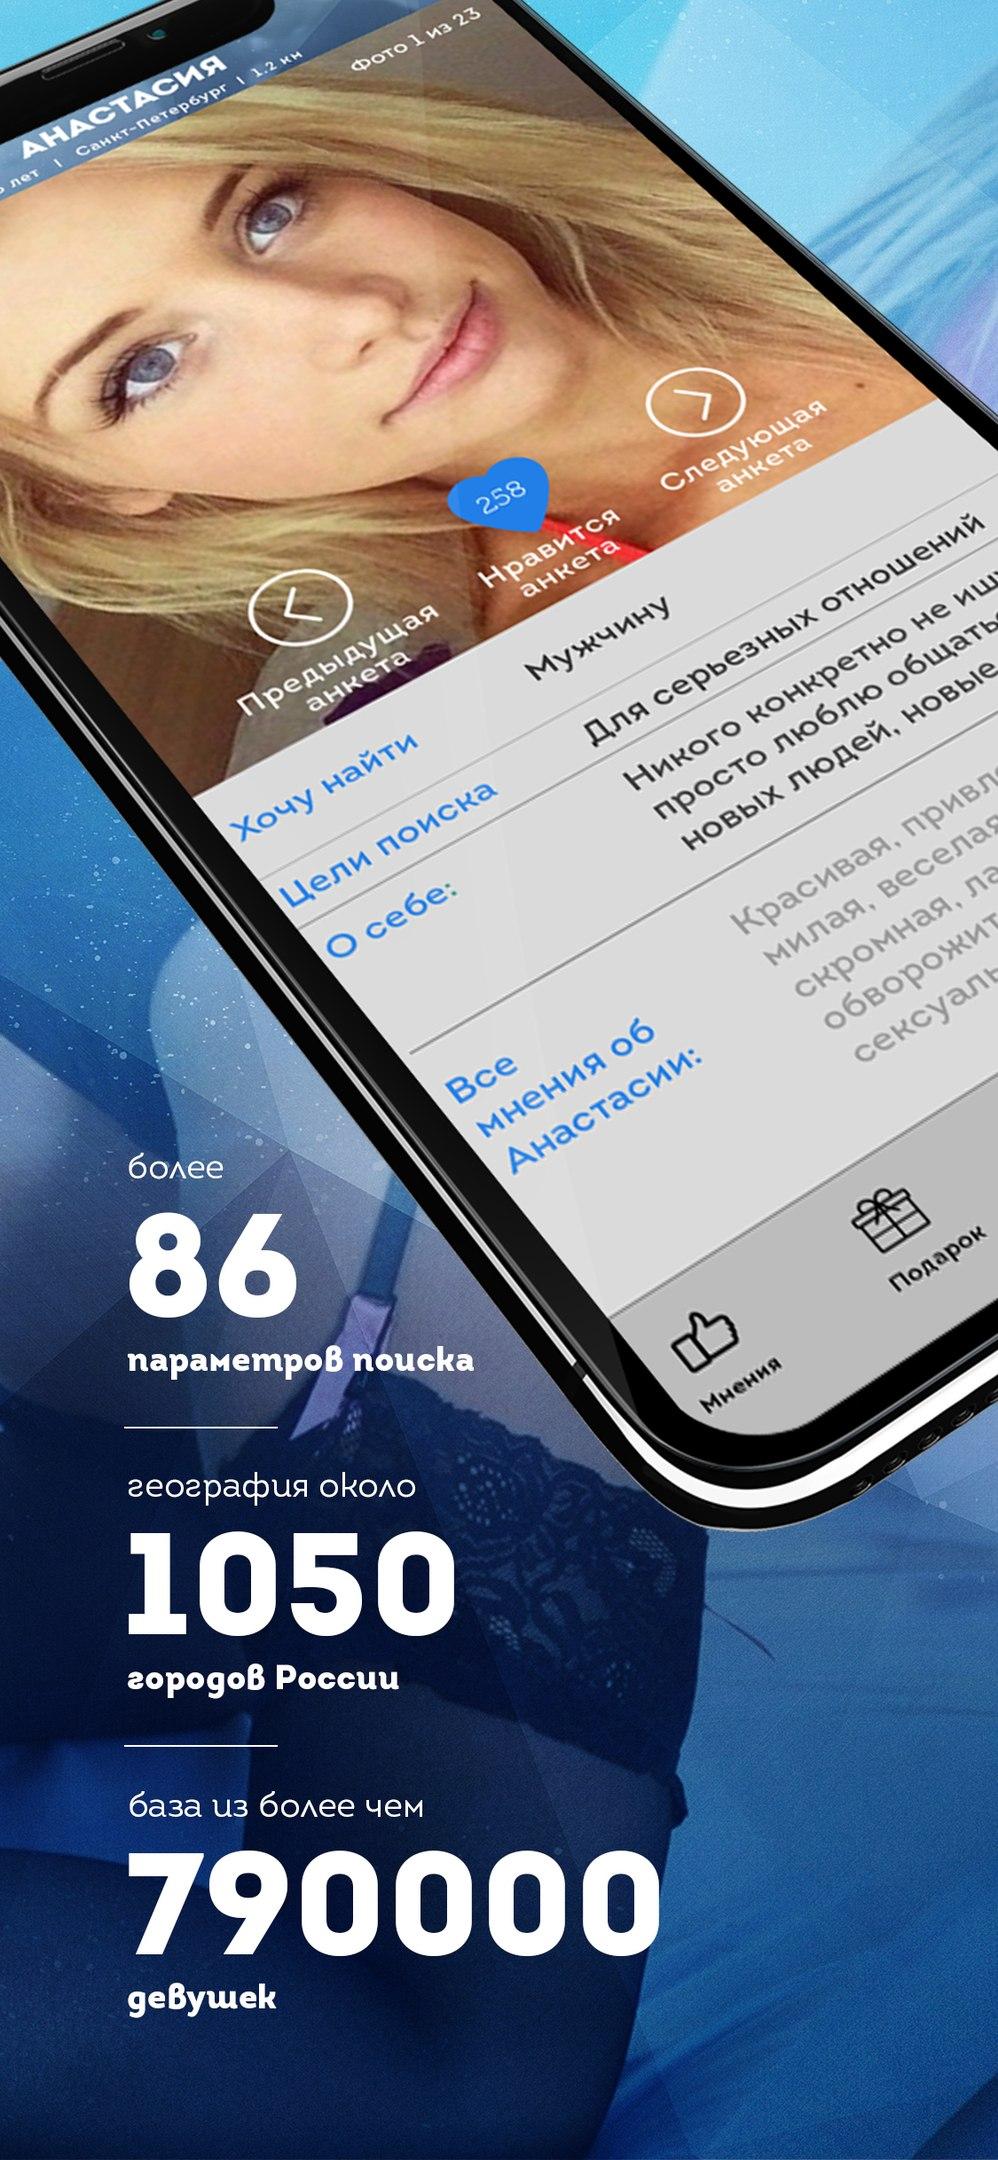 Сайты знакомств для секса петербурга служба знакомств москва для секса